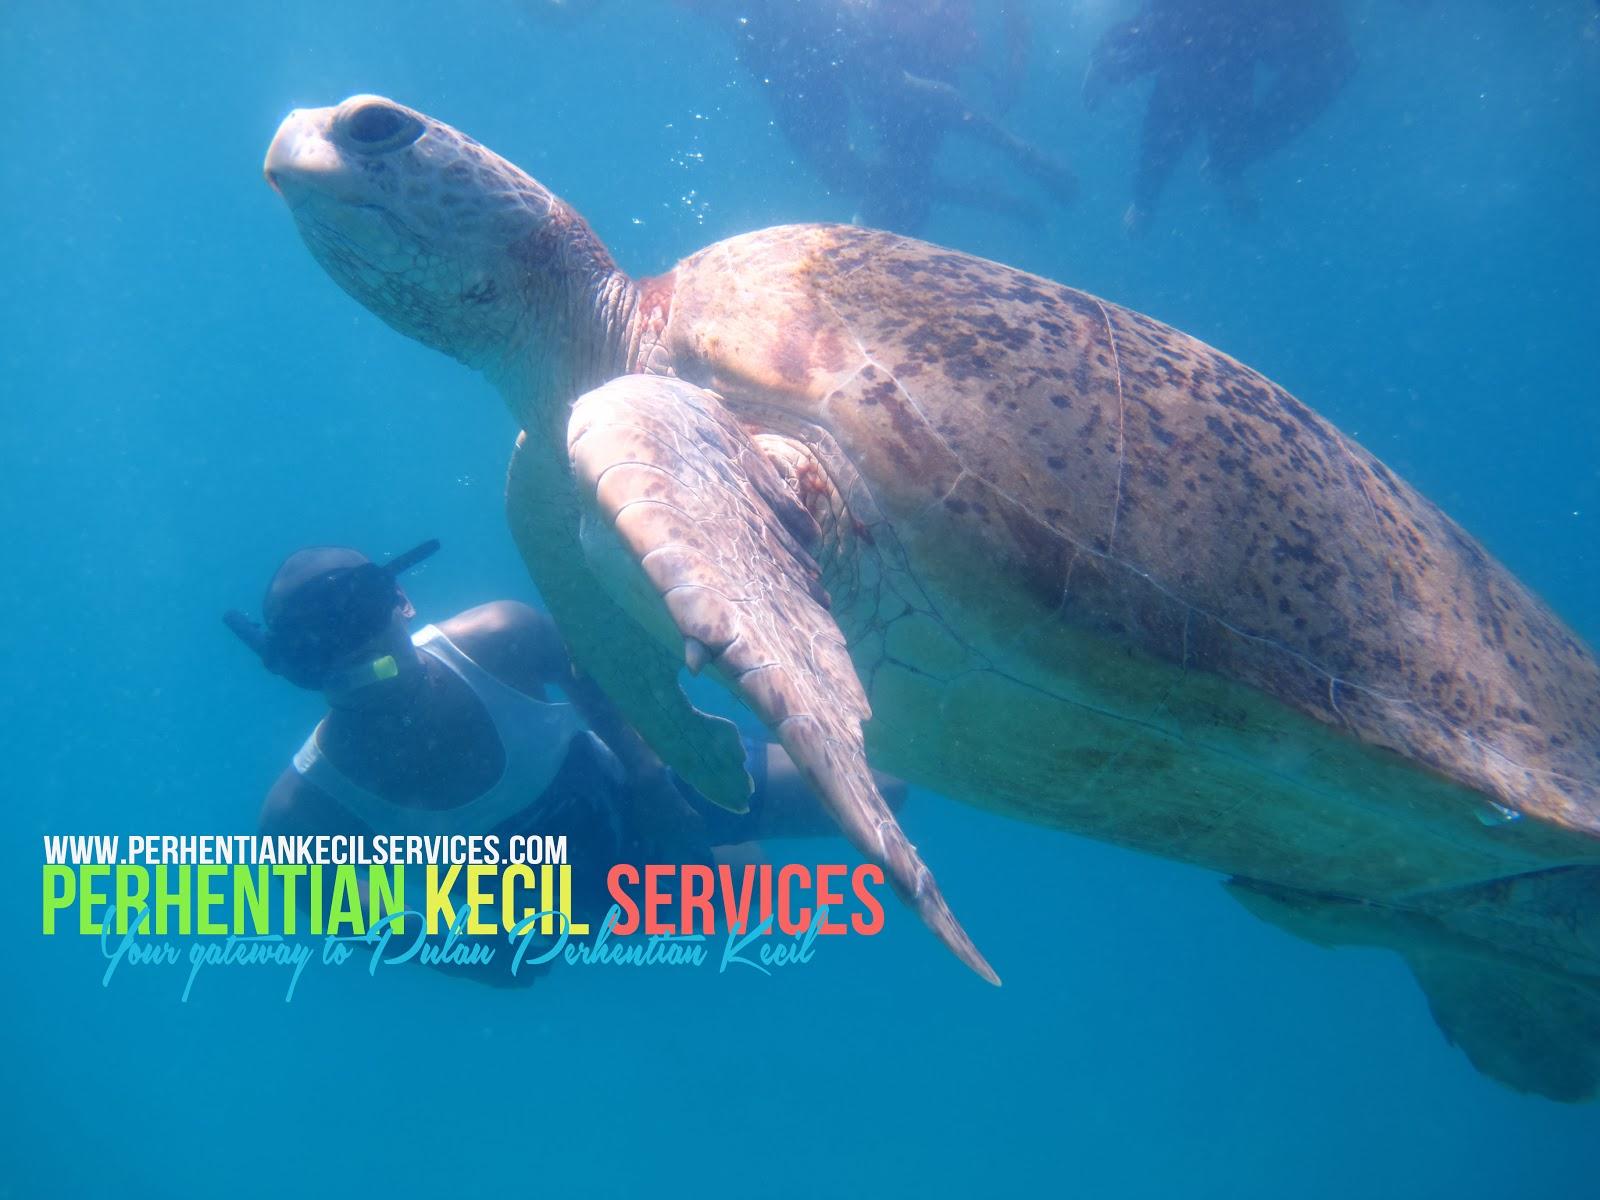 pakej 3 hari 2 malam snorkeling perhentian, pakej 4 hari 3 malam snorkeling pulau perhentian, pakej murah snorkeling perhentian, pakej bajet percutian perhentian, pakej percutian berkumpulan pulau perhentian, pakej murah pulau malaysia